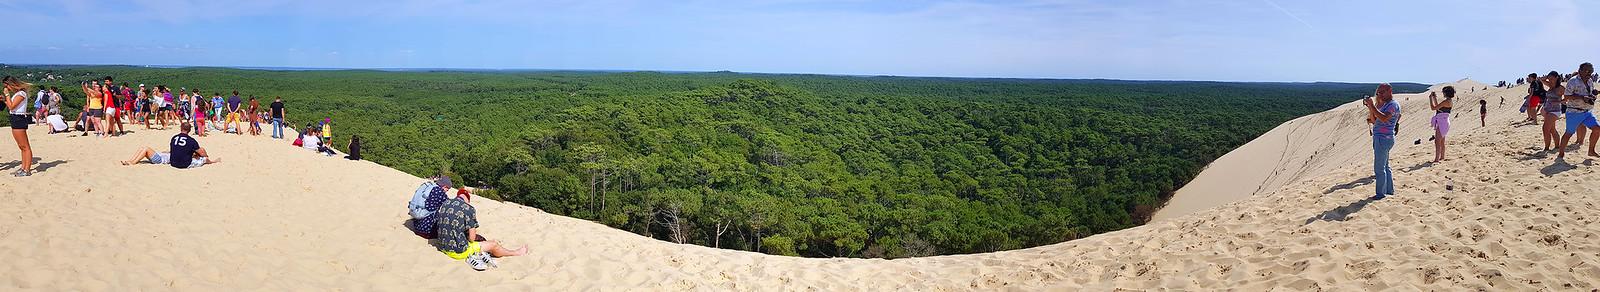 Dune du Pilat Francia Burdeos dune du pilat - 31094139587 4189c23bf6 h - Dune du Pilat, la duna de arena más alta de Europa